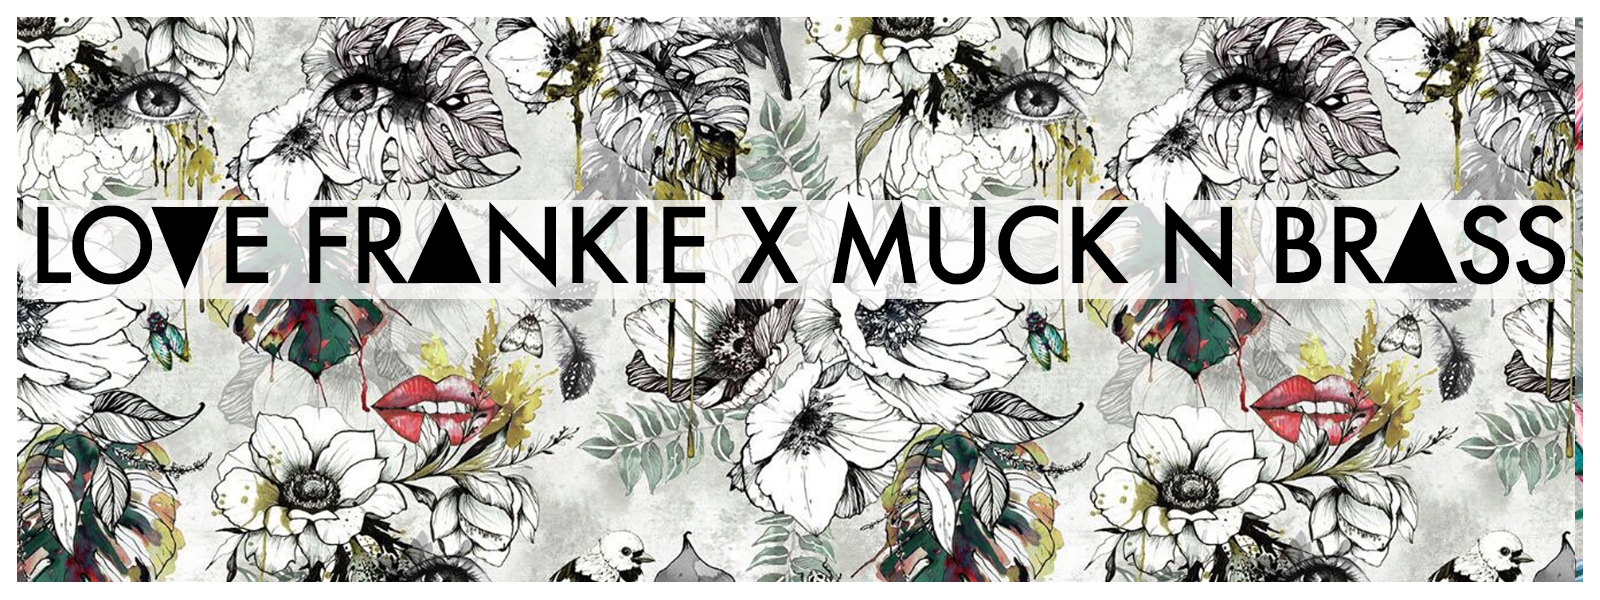 Muck N Brass collection